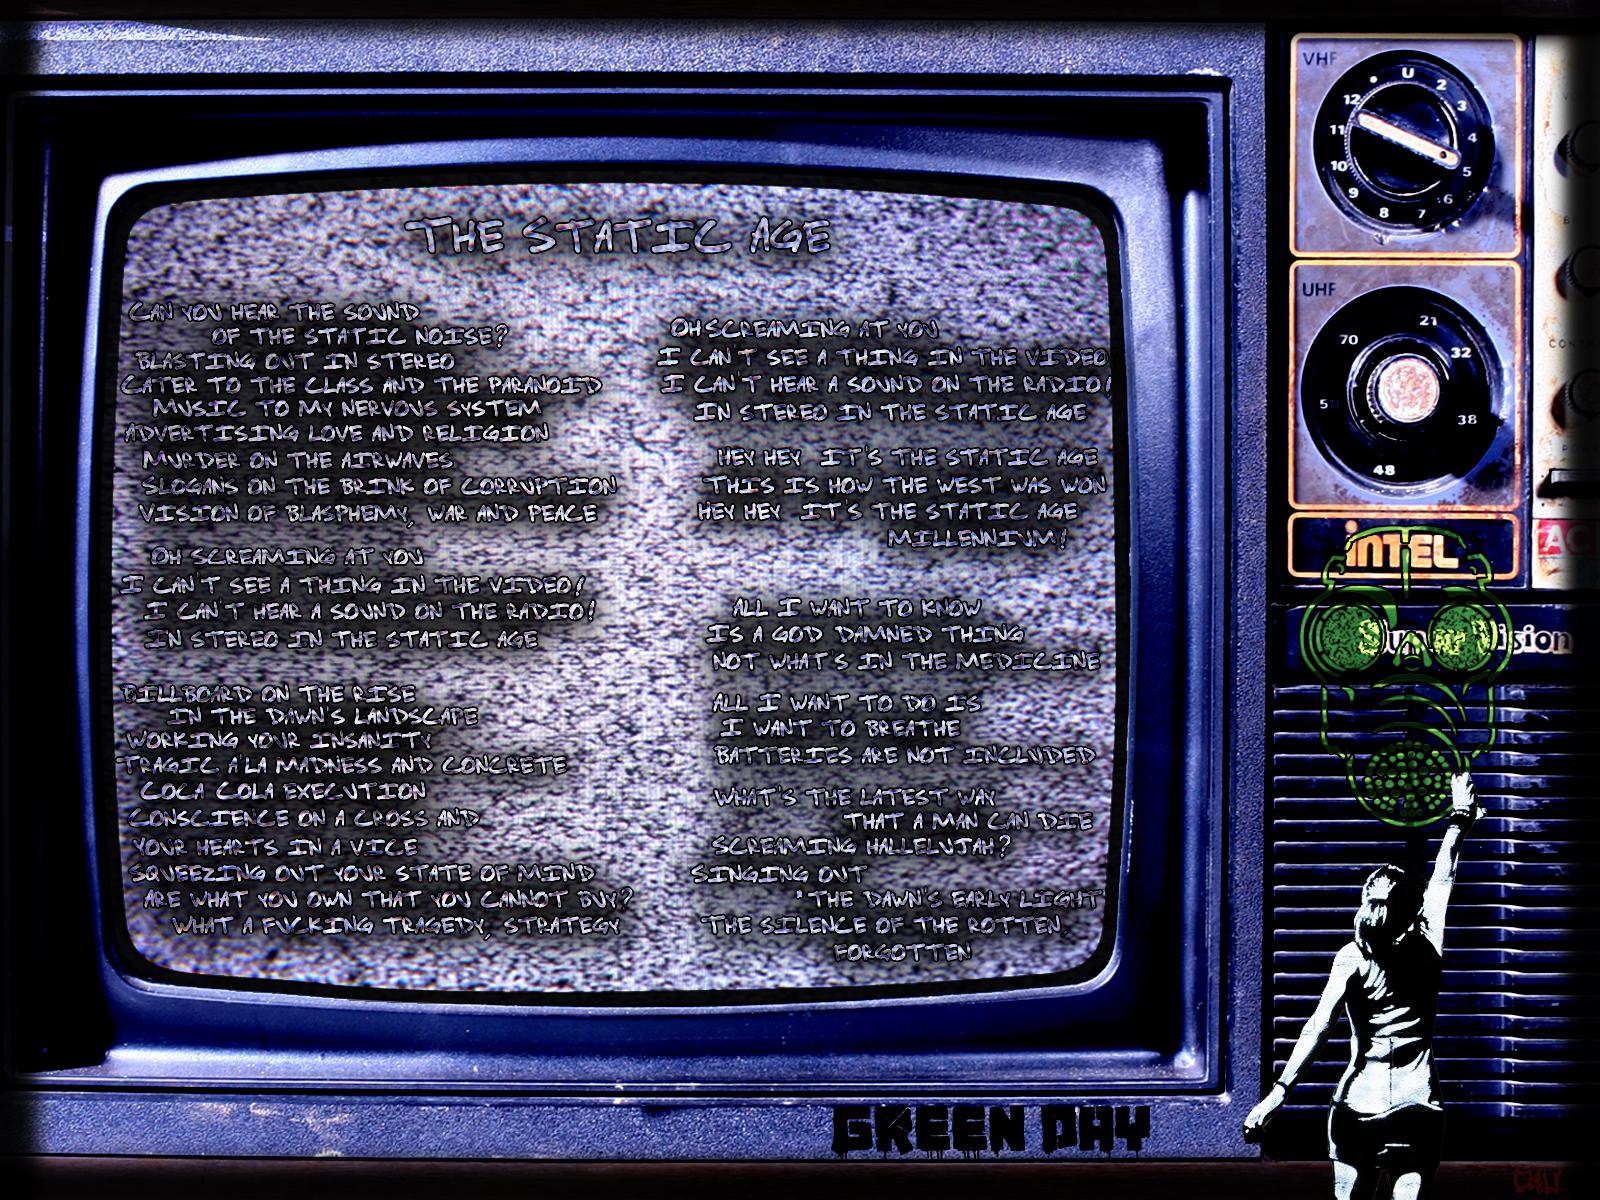 Green Day: The Static Age-Lyrics